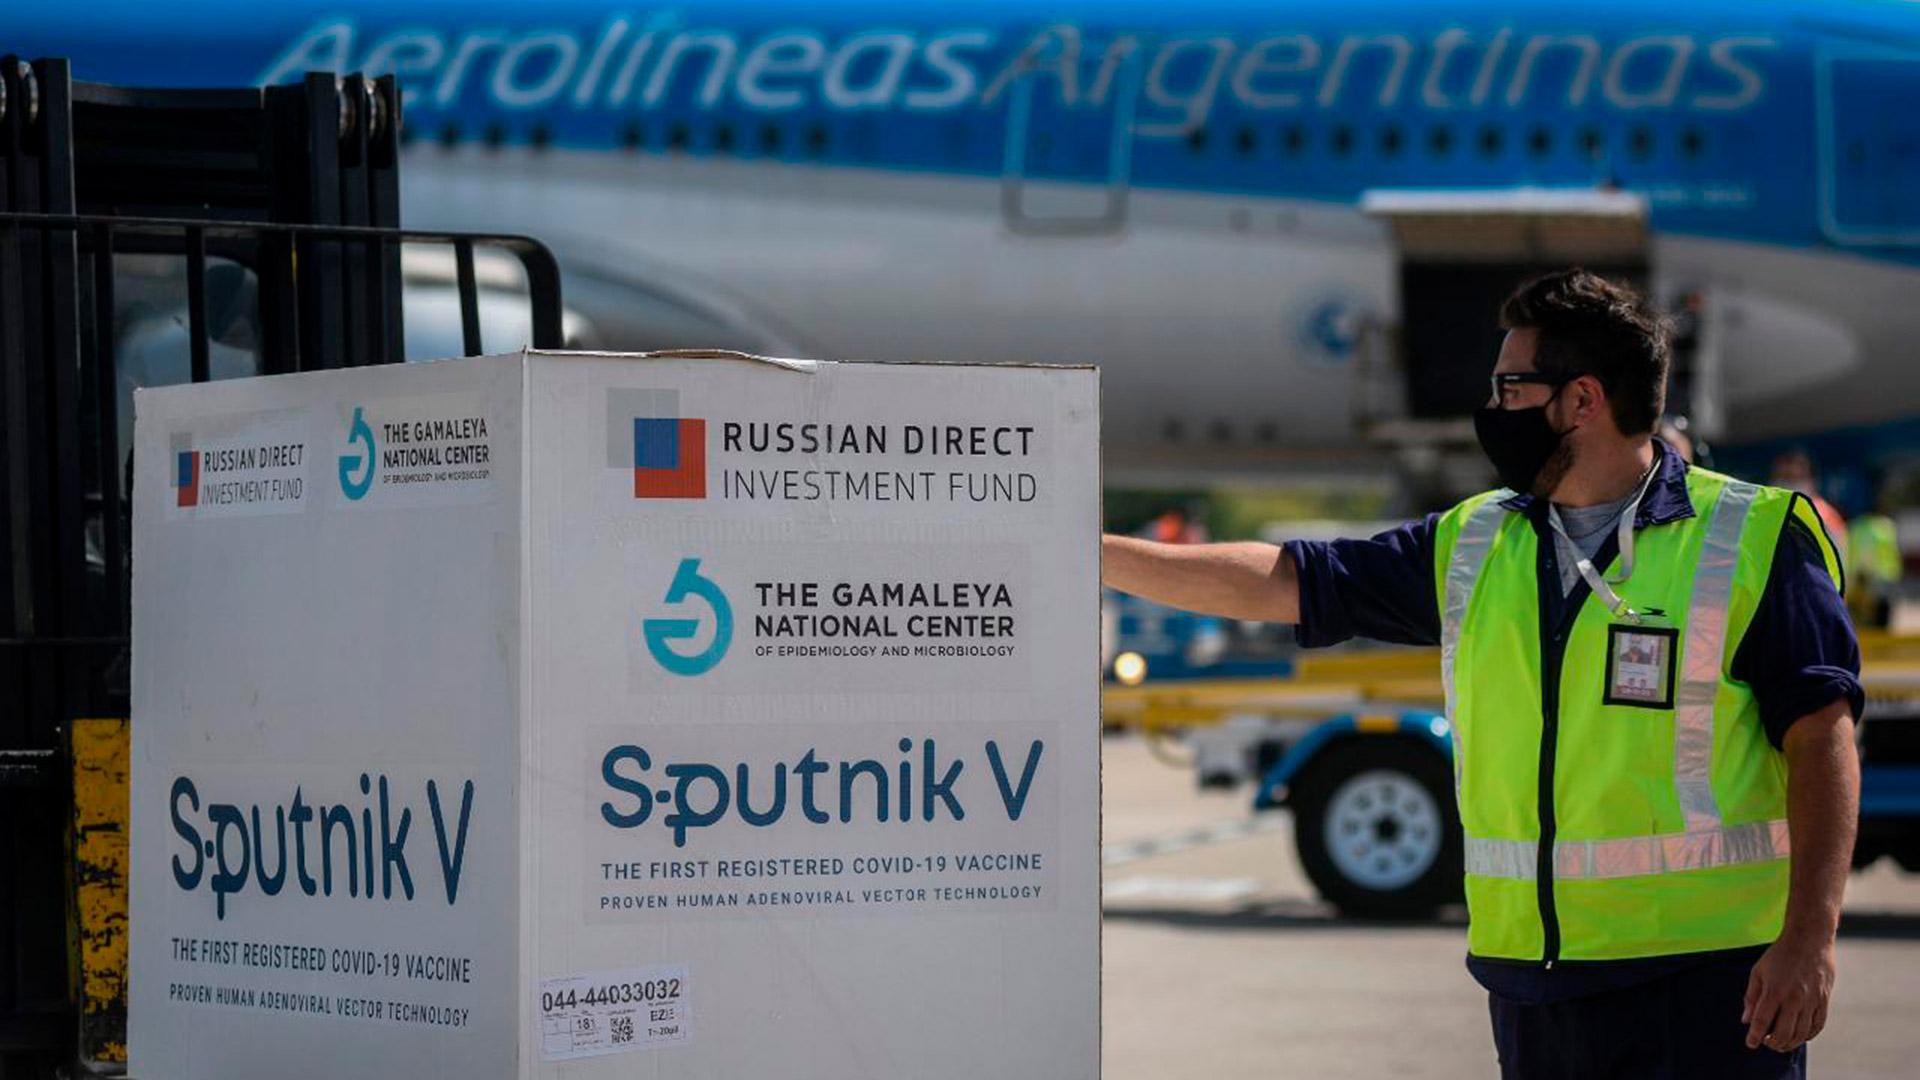 Llegaron a la Argentina otras 500 mil dosis de la vacuna Sputnik V contra el coronavirus